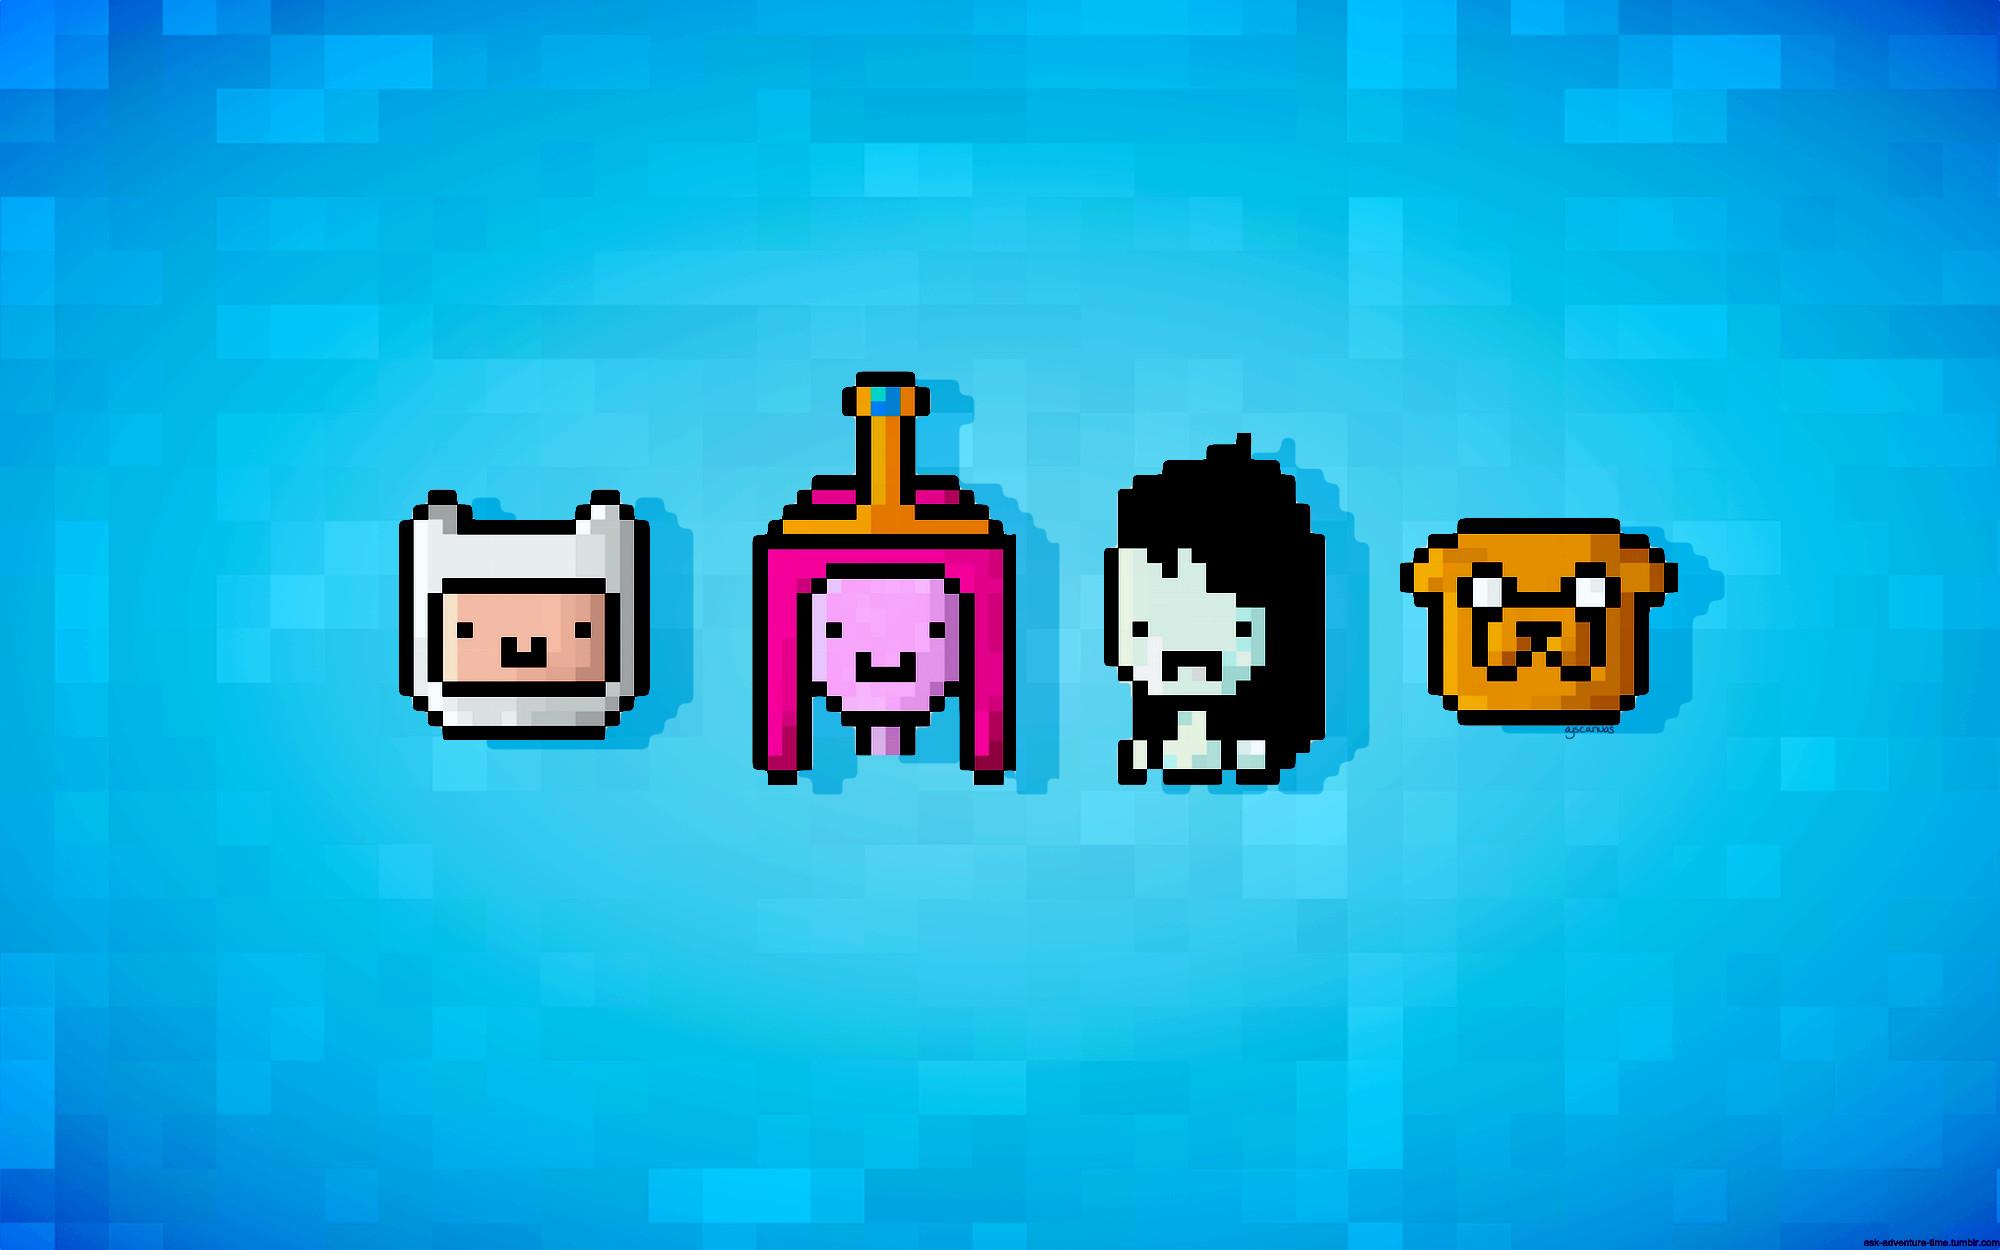 Res: 2000x1250, Adventure Time, Princess Bubblegum, 16-bit, Finn and Jake - Free Wallpaper  / WallpaperJam.com